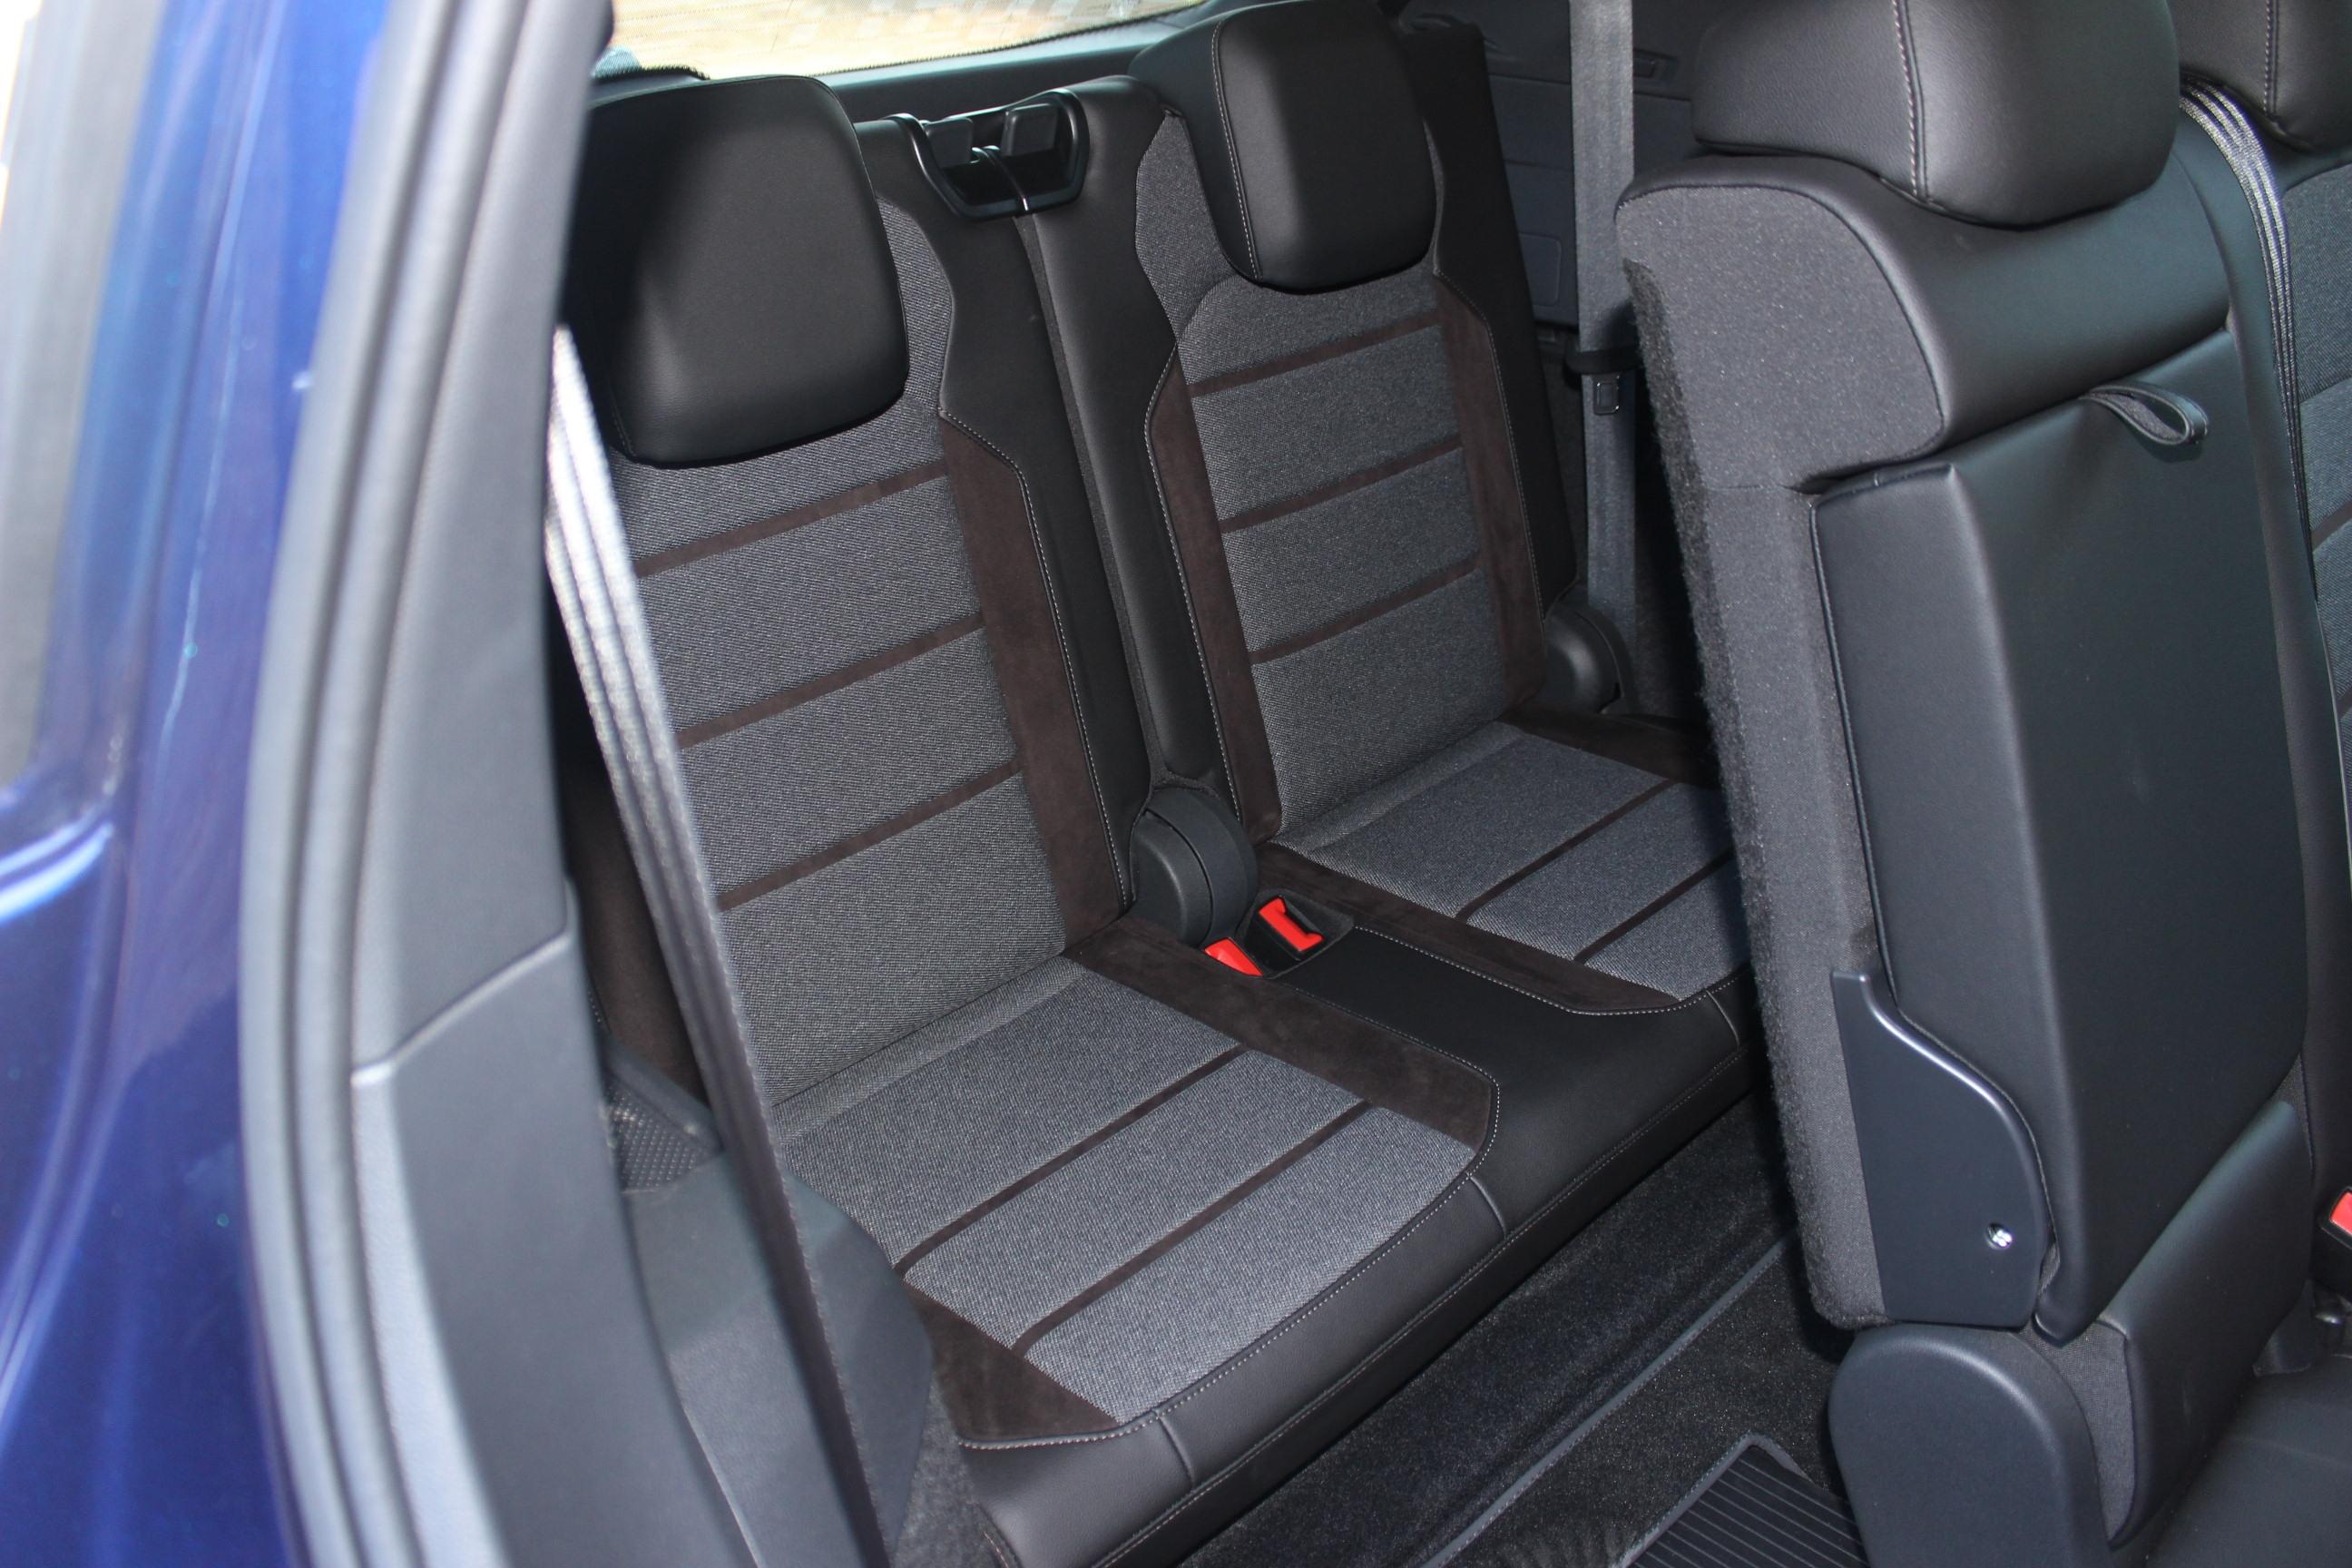 2018 - [Seat] Tarraco - Page 6 S0-prise-en-main-seat-tarraco-ibere-grand-559543